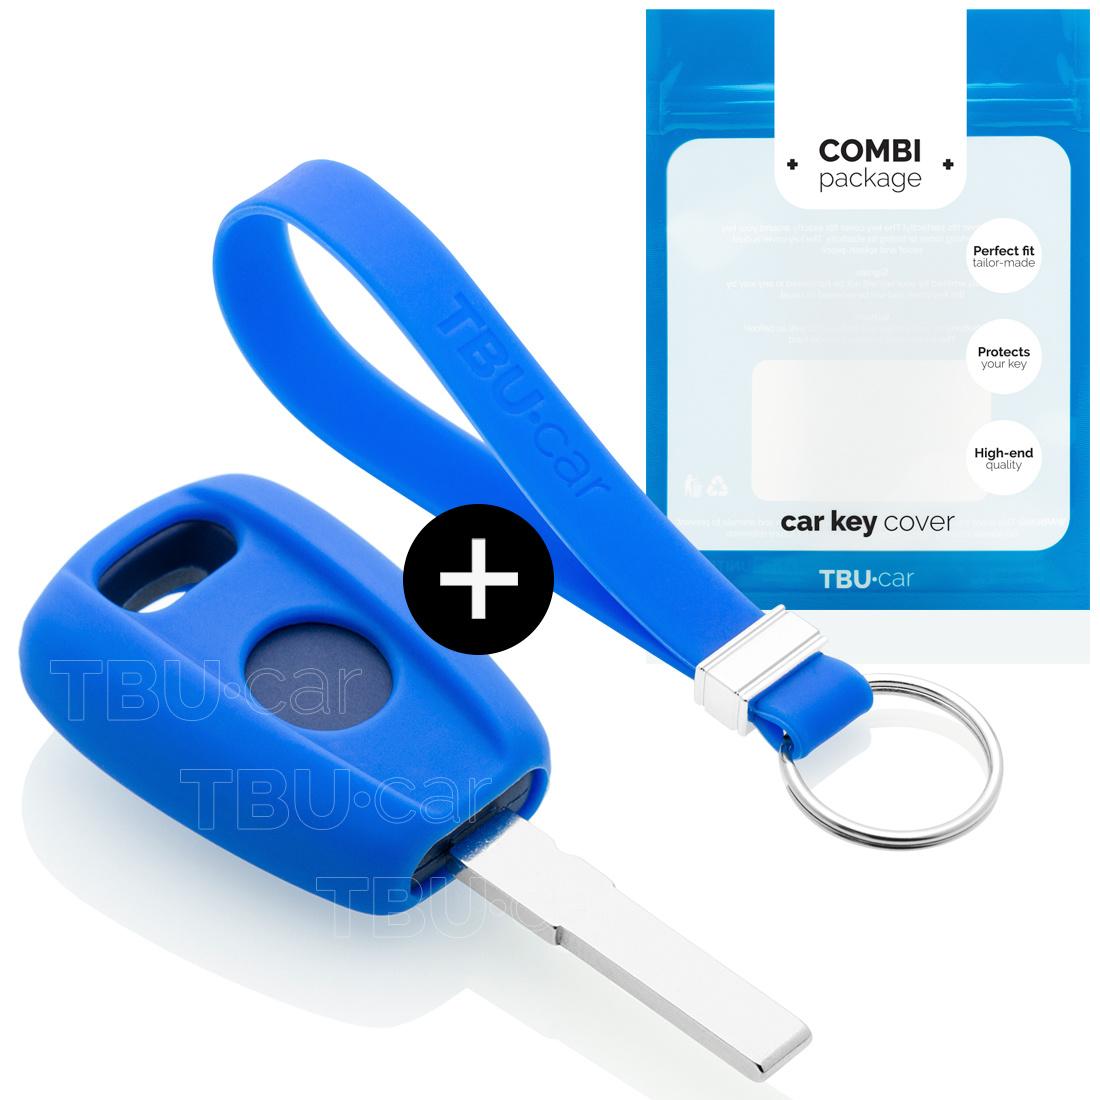 TBU car TBU car Autoschlüssel Hülle kompatibel mit Fiat 1 Taste - Schutzhülle aus Silikon - Auto Schlüsselhülle Cover in Blau